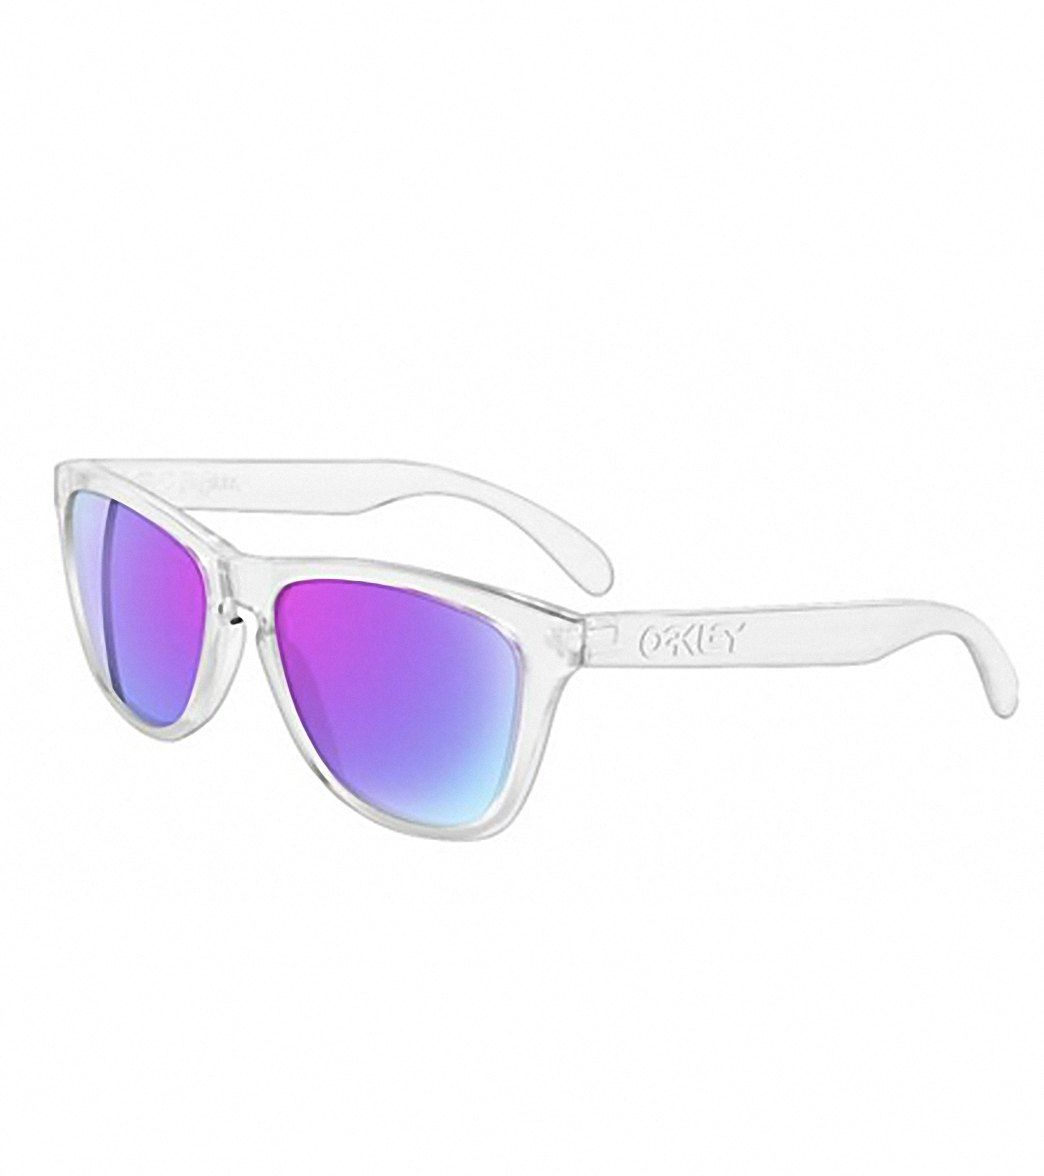 dc128b04f9 Oakley Frogskins Iridium Sunglasses at SwimOutlet.com - Free Shipping